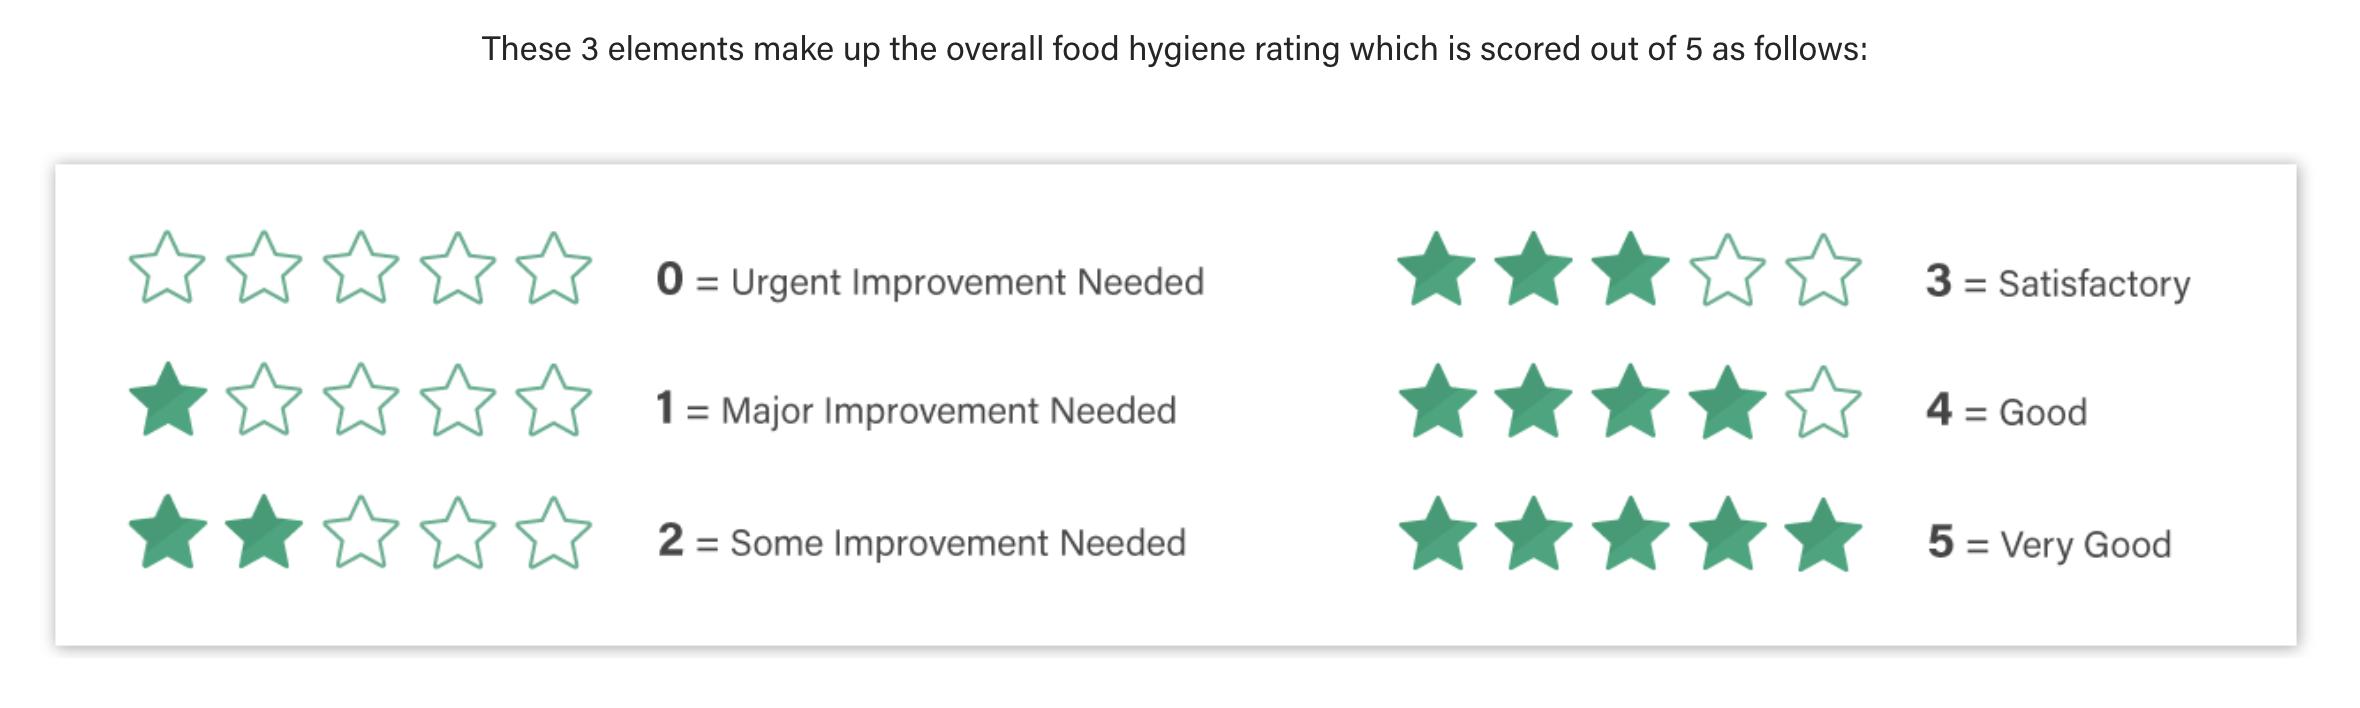 Food Hygiene Star Ratings [Full Image Description Below]